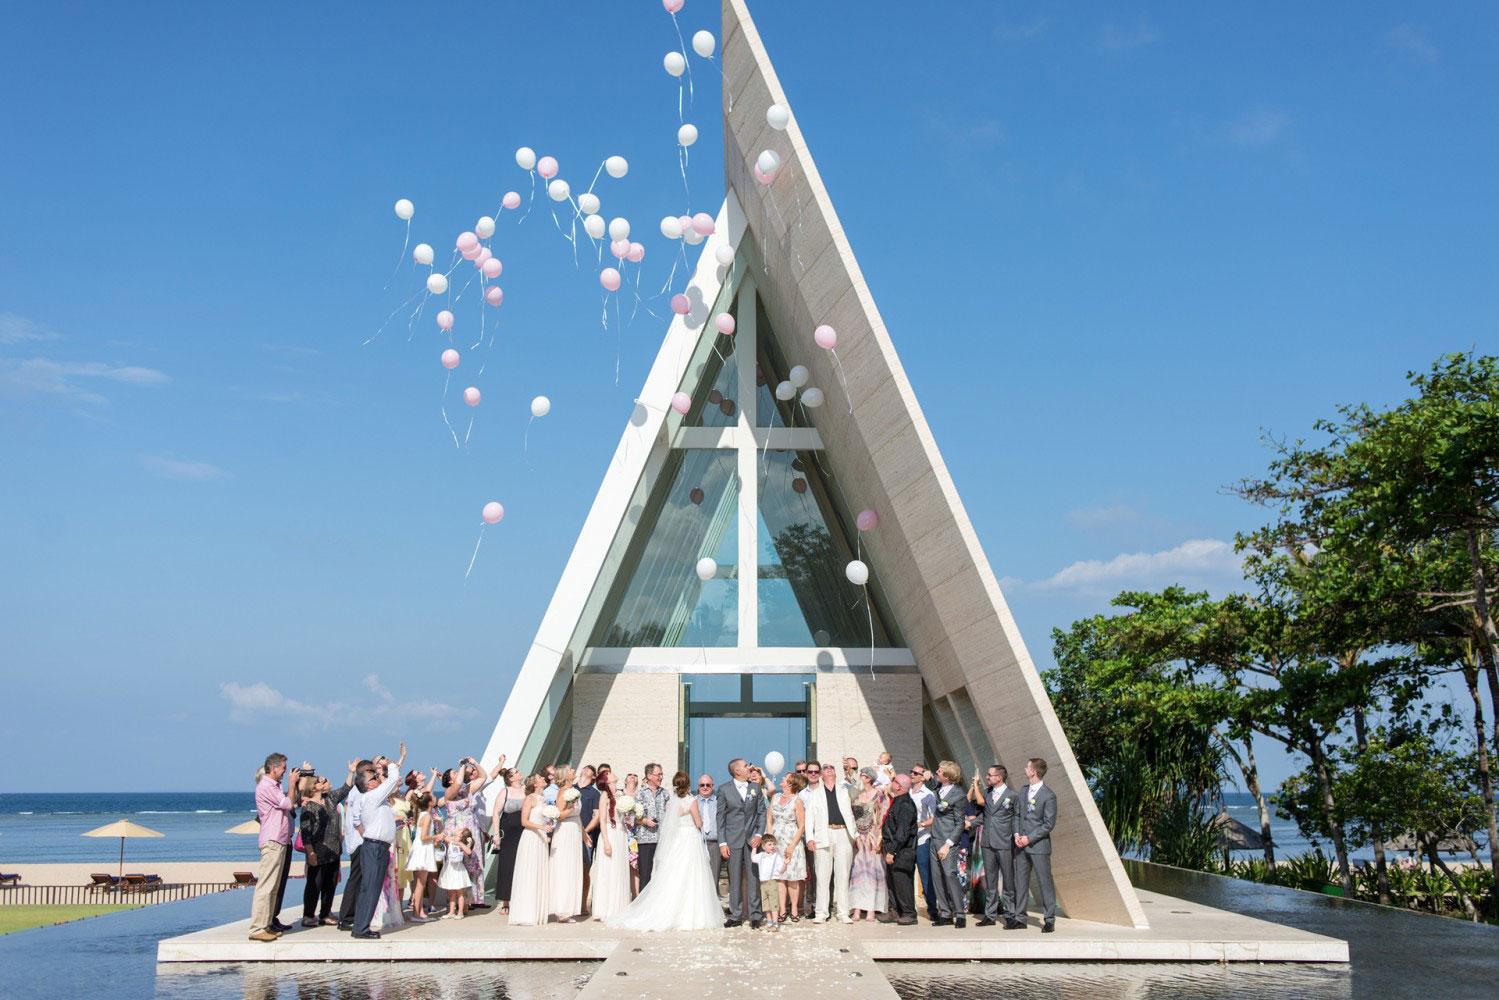 Jessica-Lemon-Photography-Adelaide-Wedding-Photographer.jpg